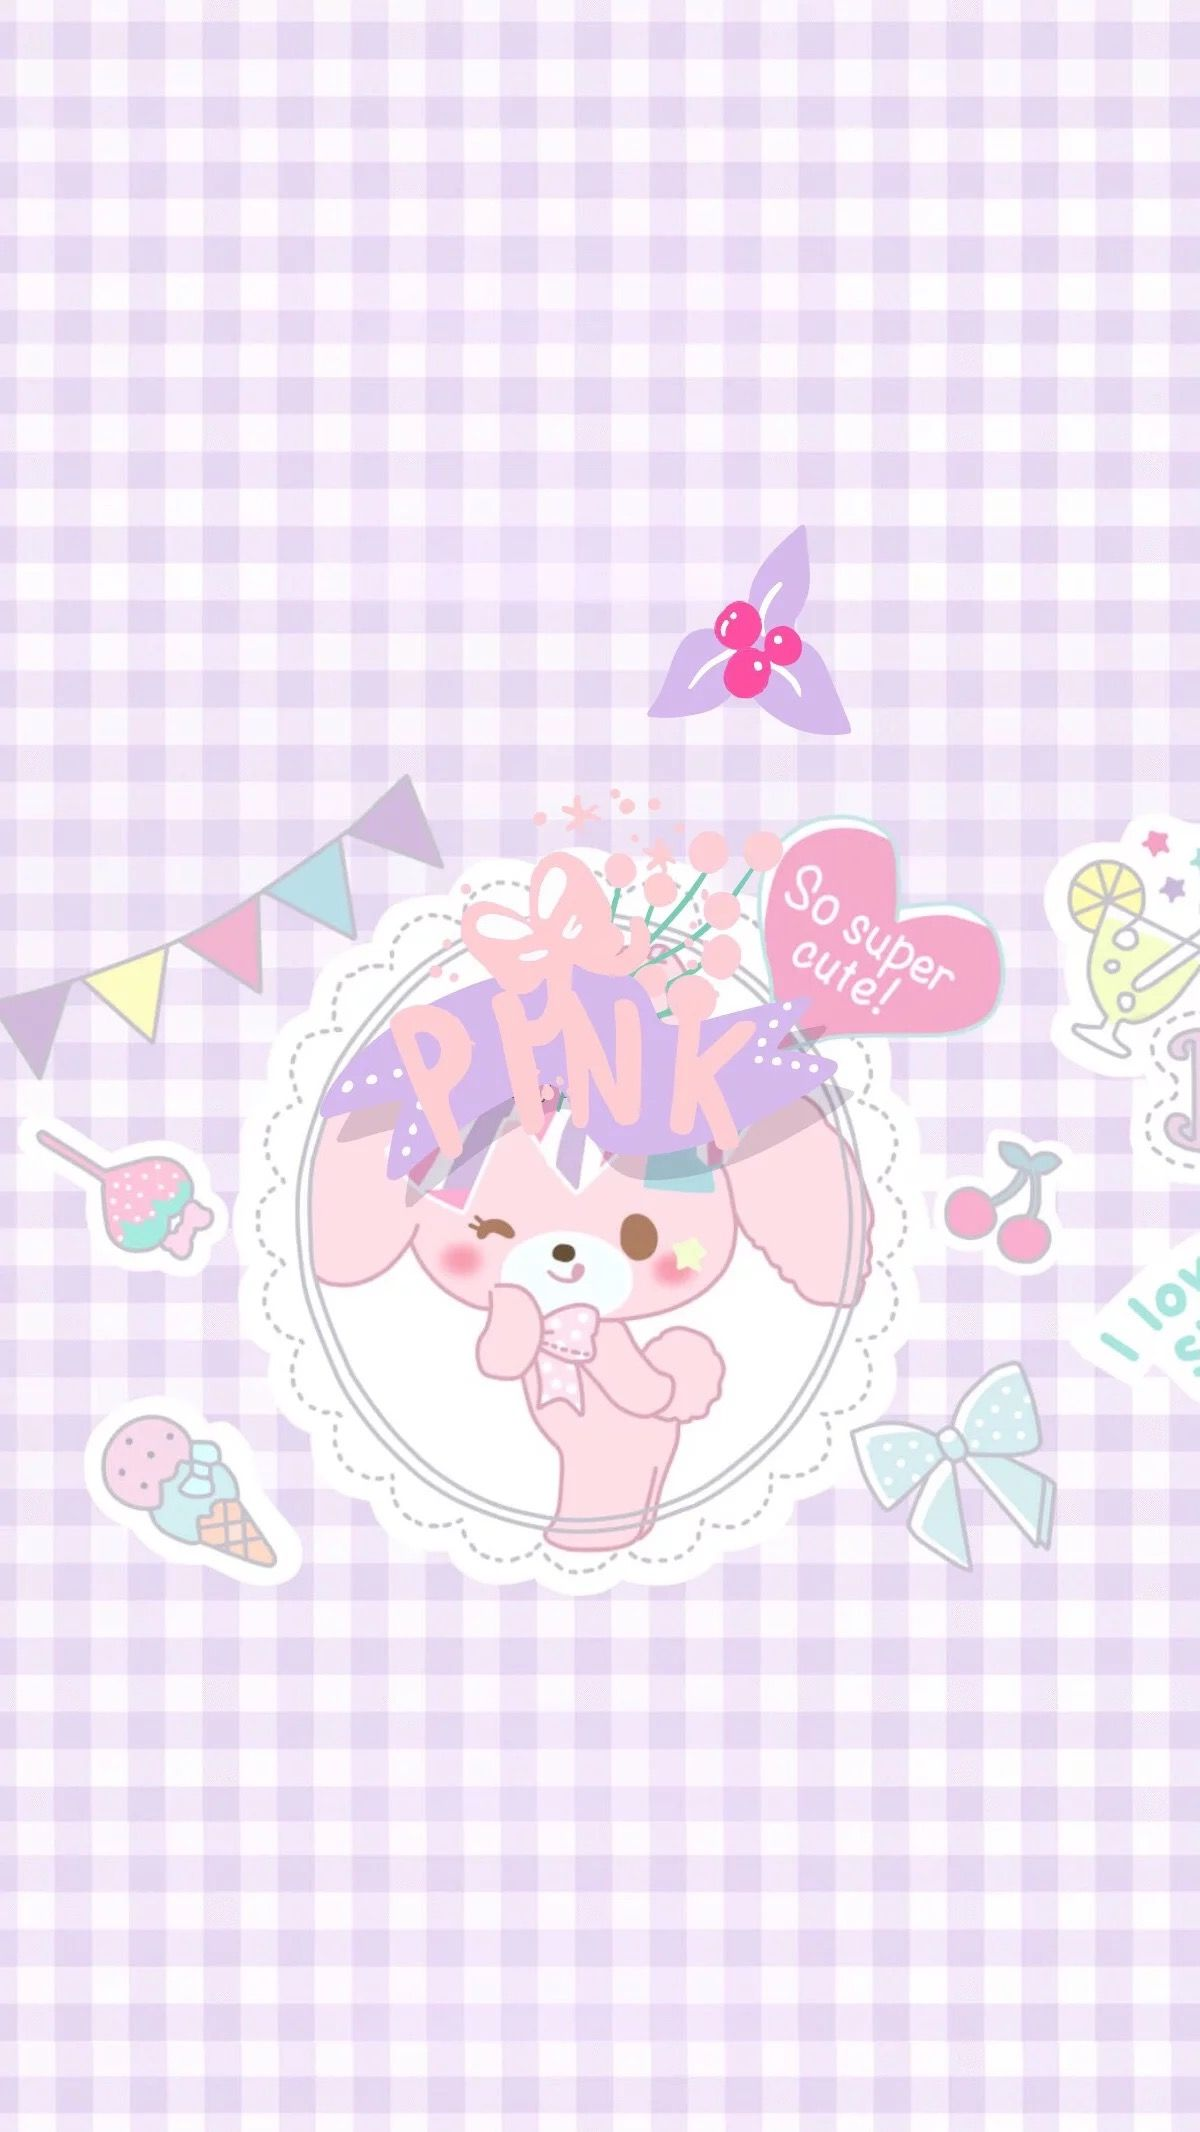 Simple Wallpaper Hello Kitty Ribbon - 1e9686f1e054580f1a9ae1465793a912  You Should Have_525029.jpg